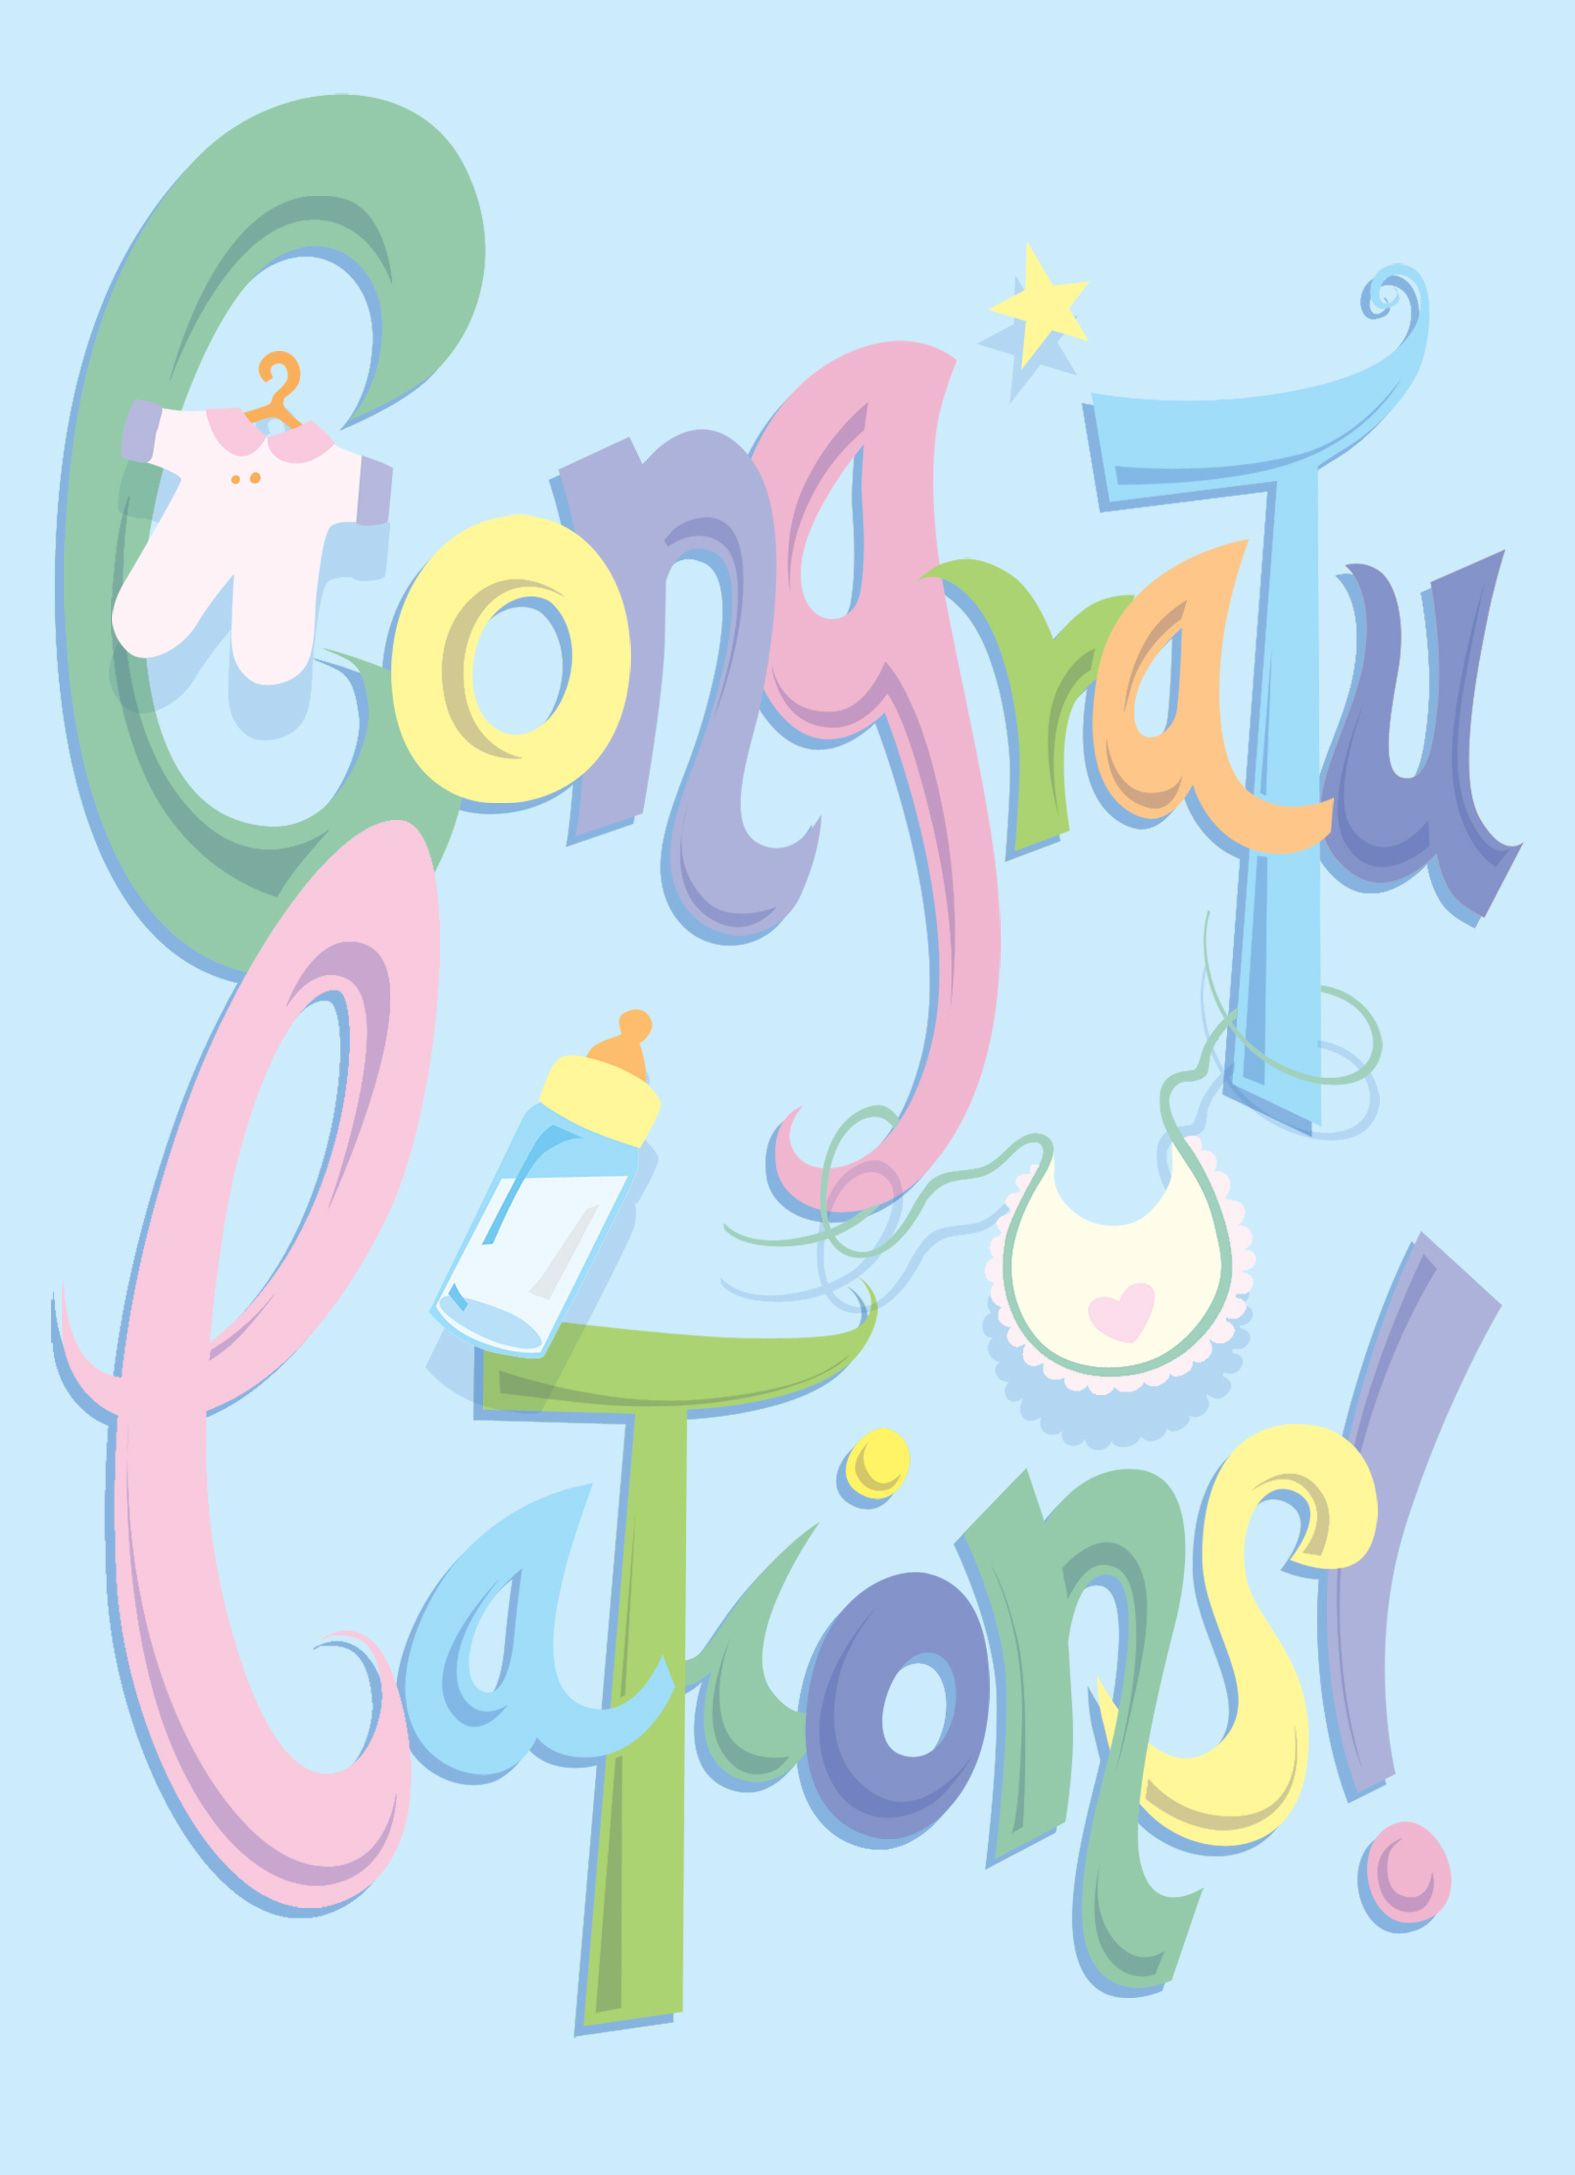 Serene Congratulations On New Congratulations On New Baby Congrats On Baby Announcement Congrats On Baby Sayings baby shower Congrats On Baby